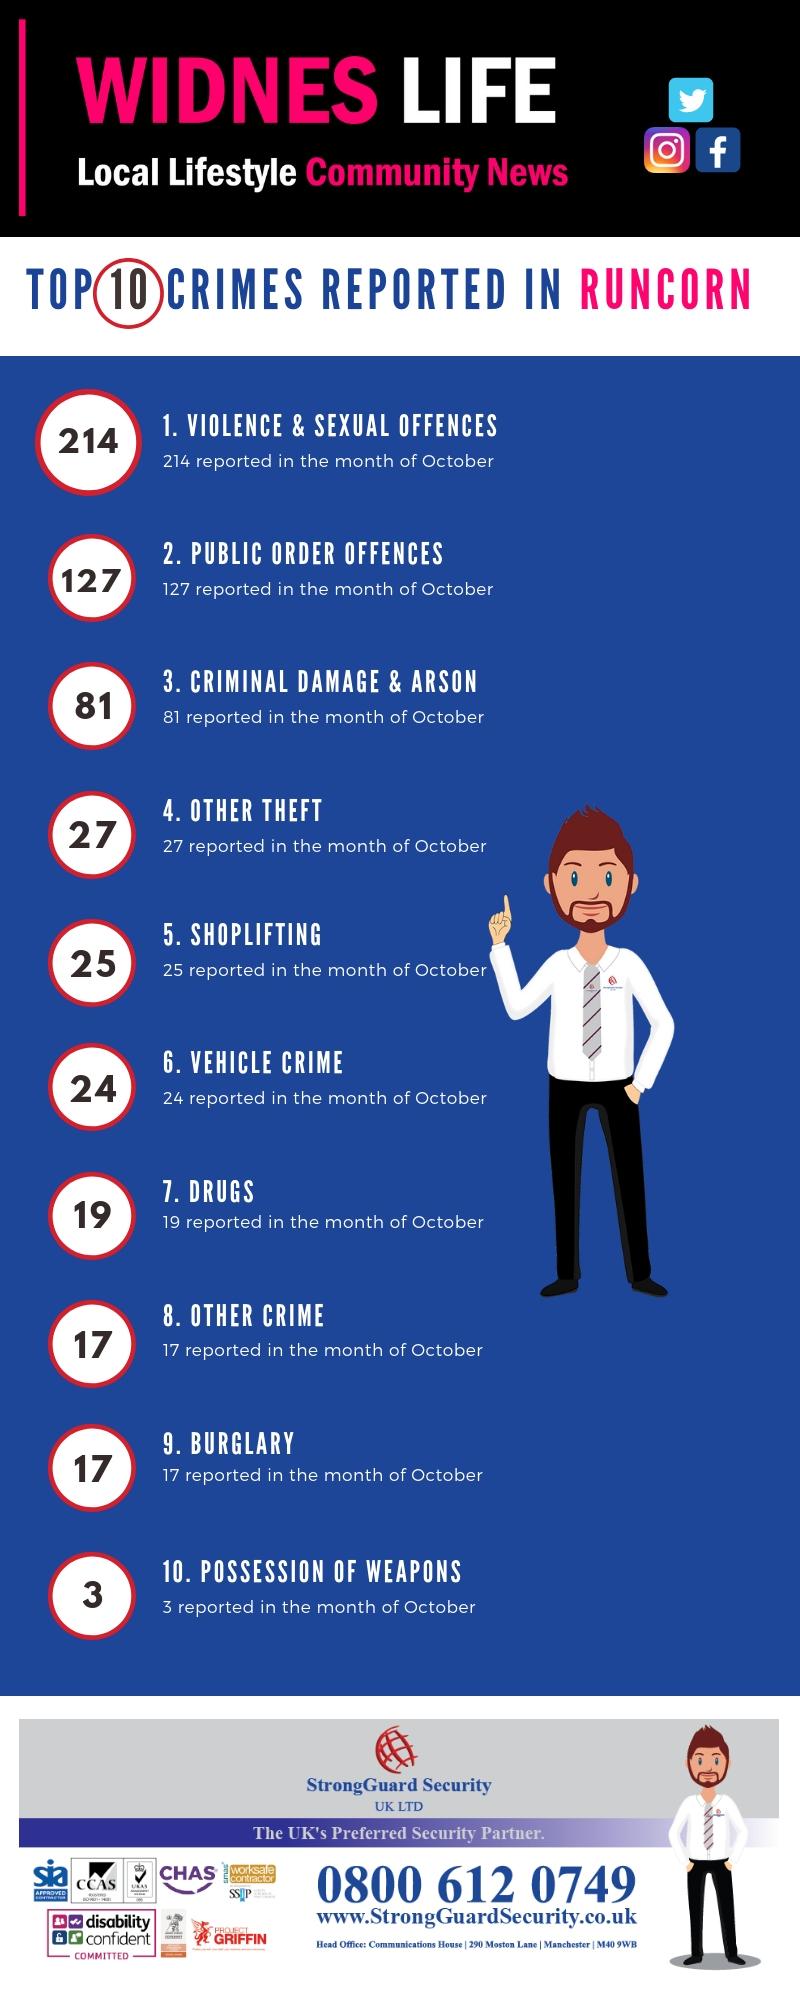 10 MOST REPORTED CRIMES IN RUNCORN - OCTOBER 2018